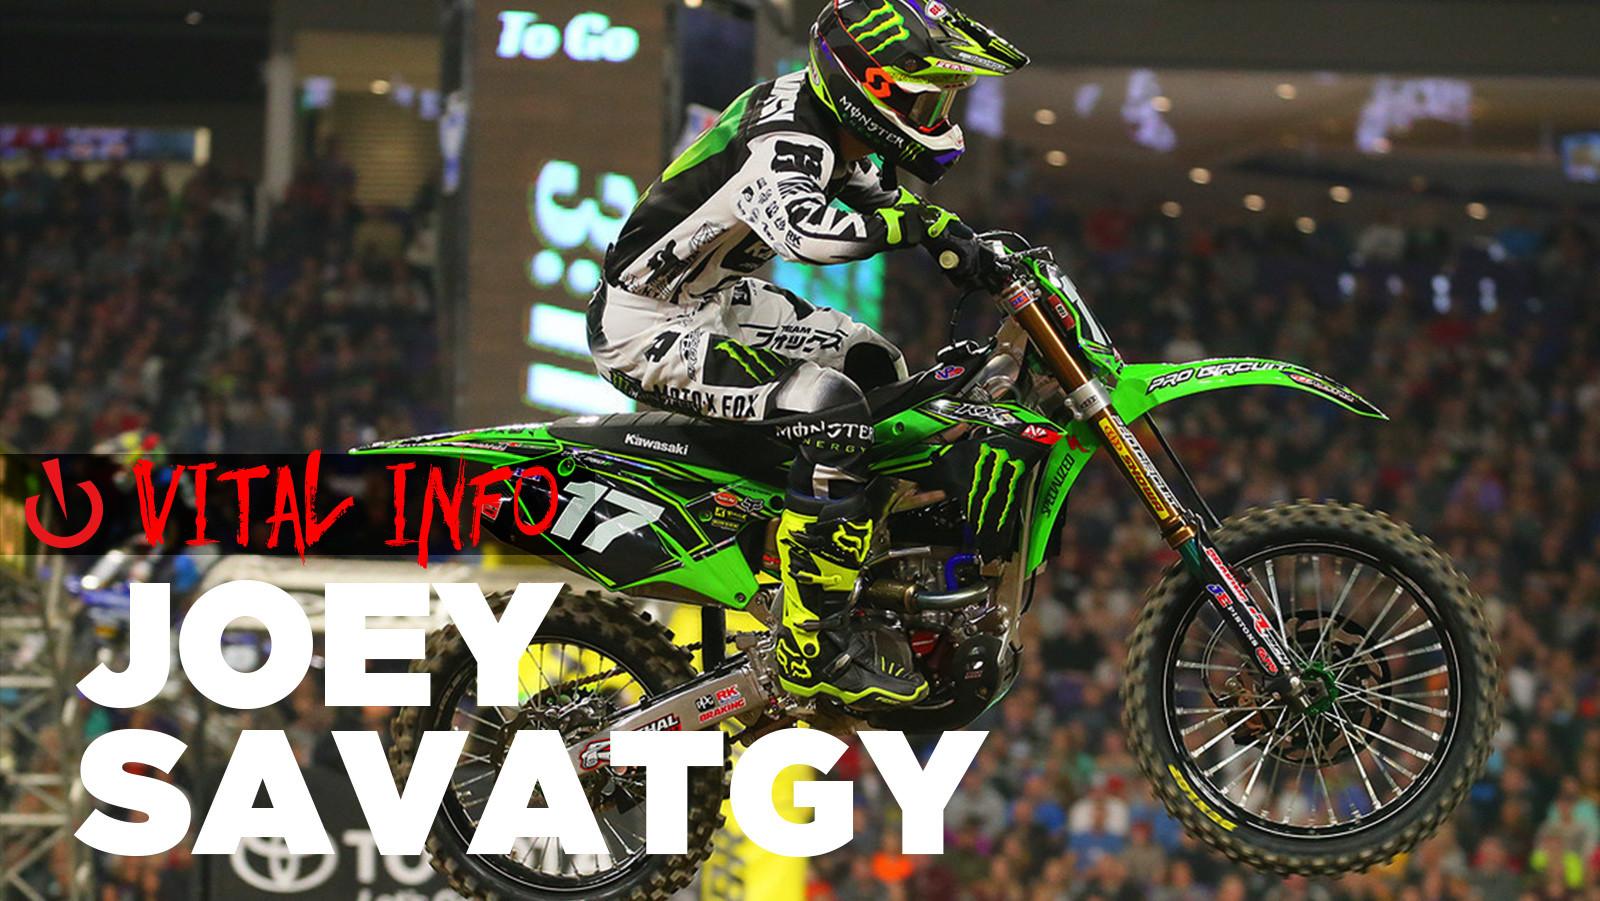 Vital Info: Joey Savatgy